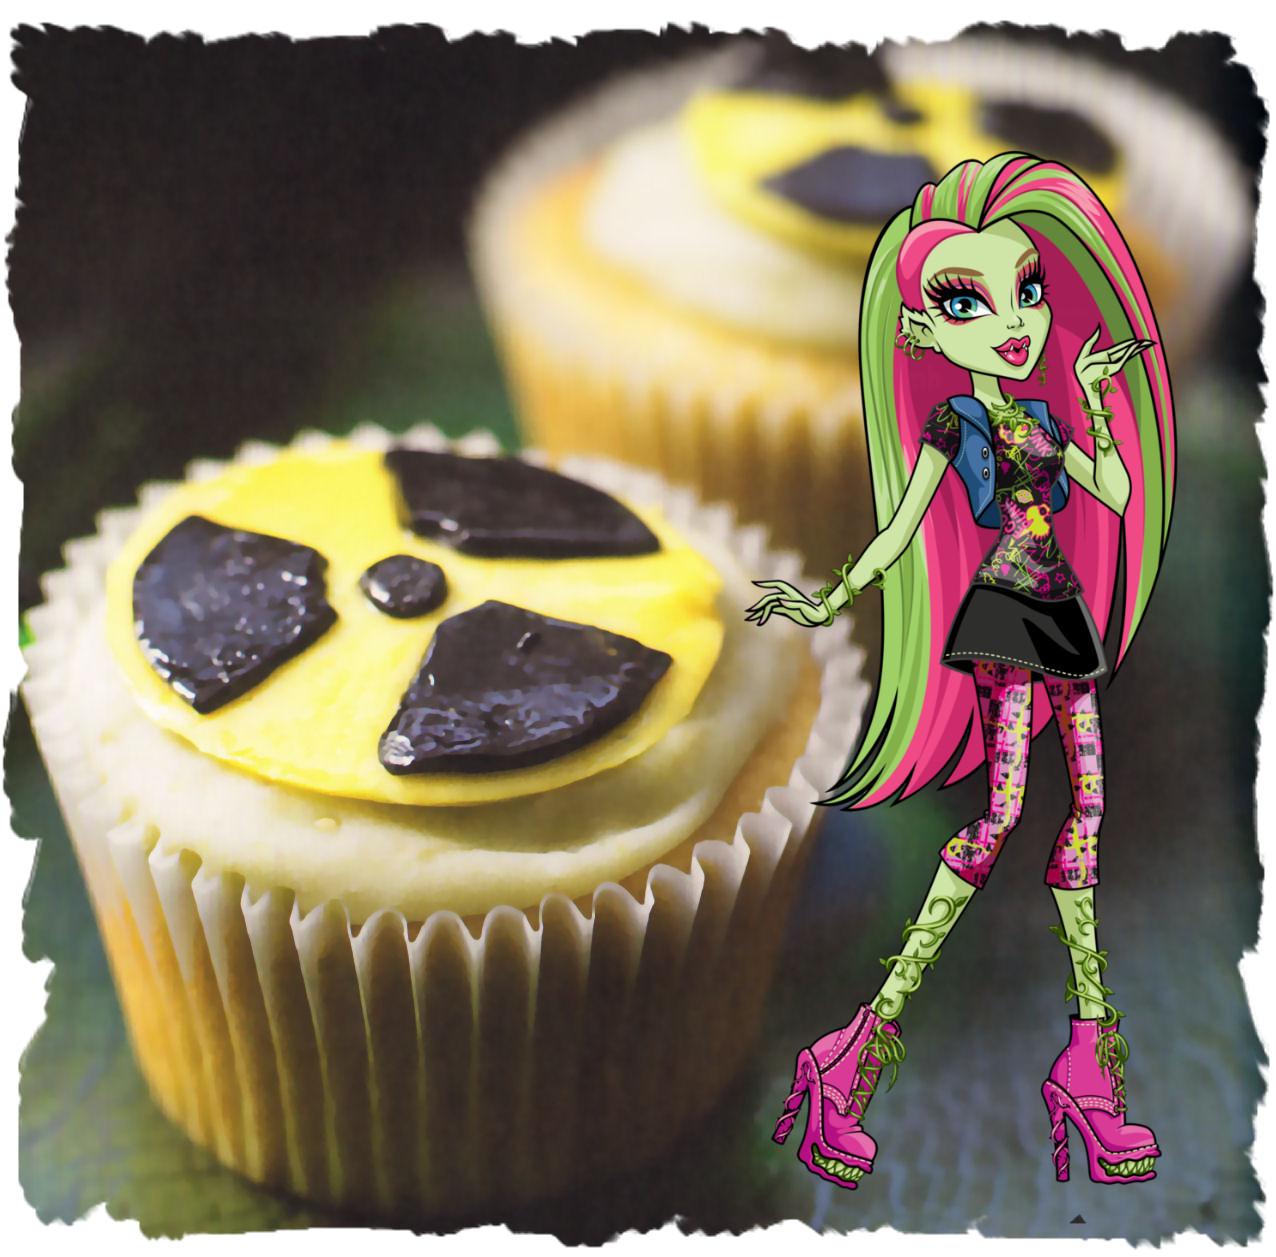 venus mcflytrap cupcakes baba radiactiva